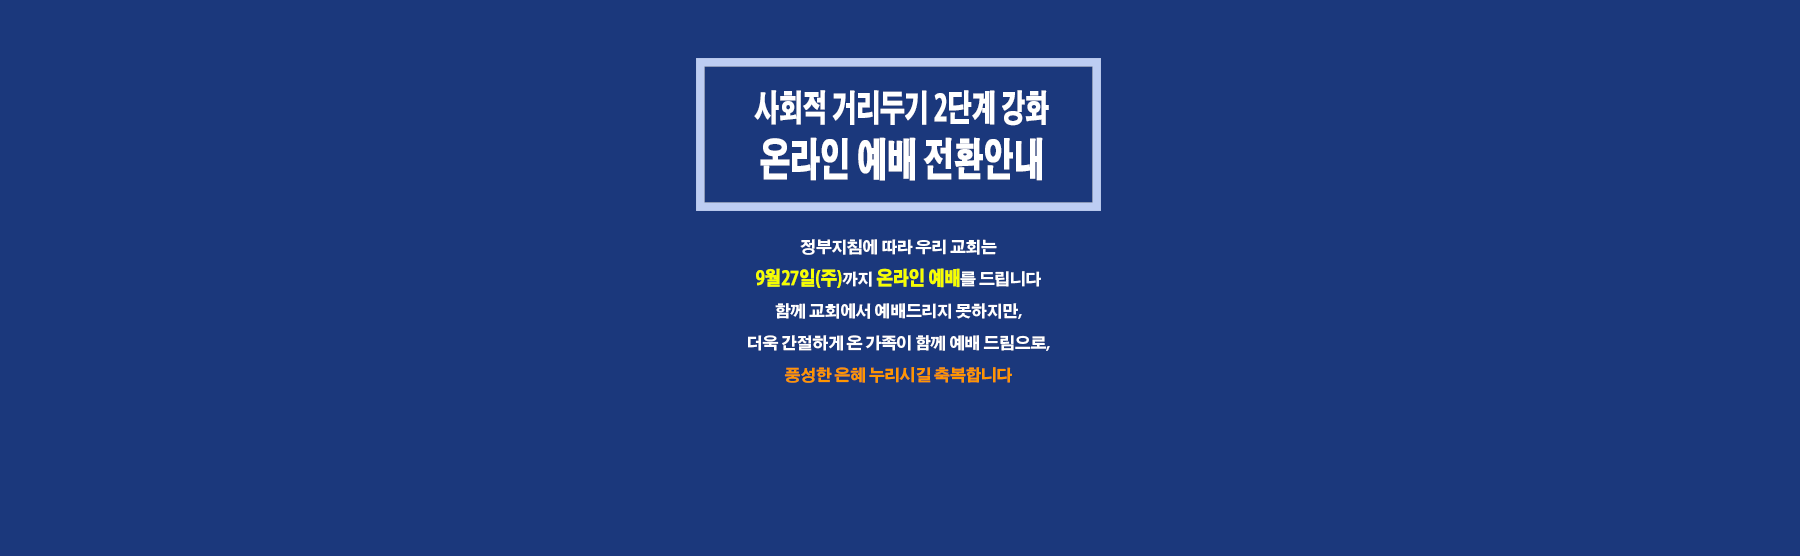 ban_sl-사회적거리두기2단계-200918-3png